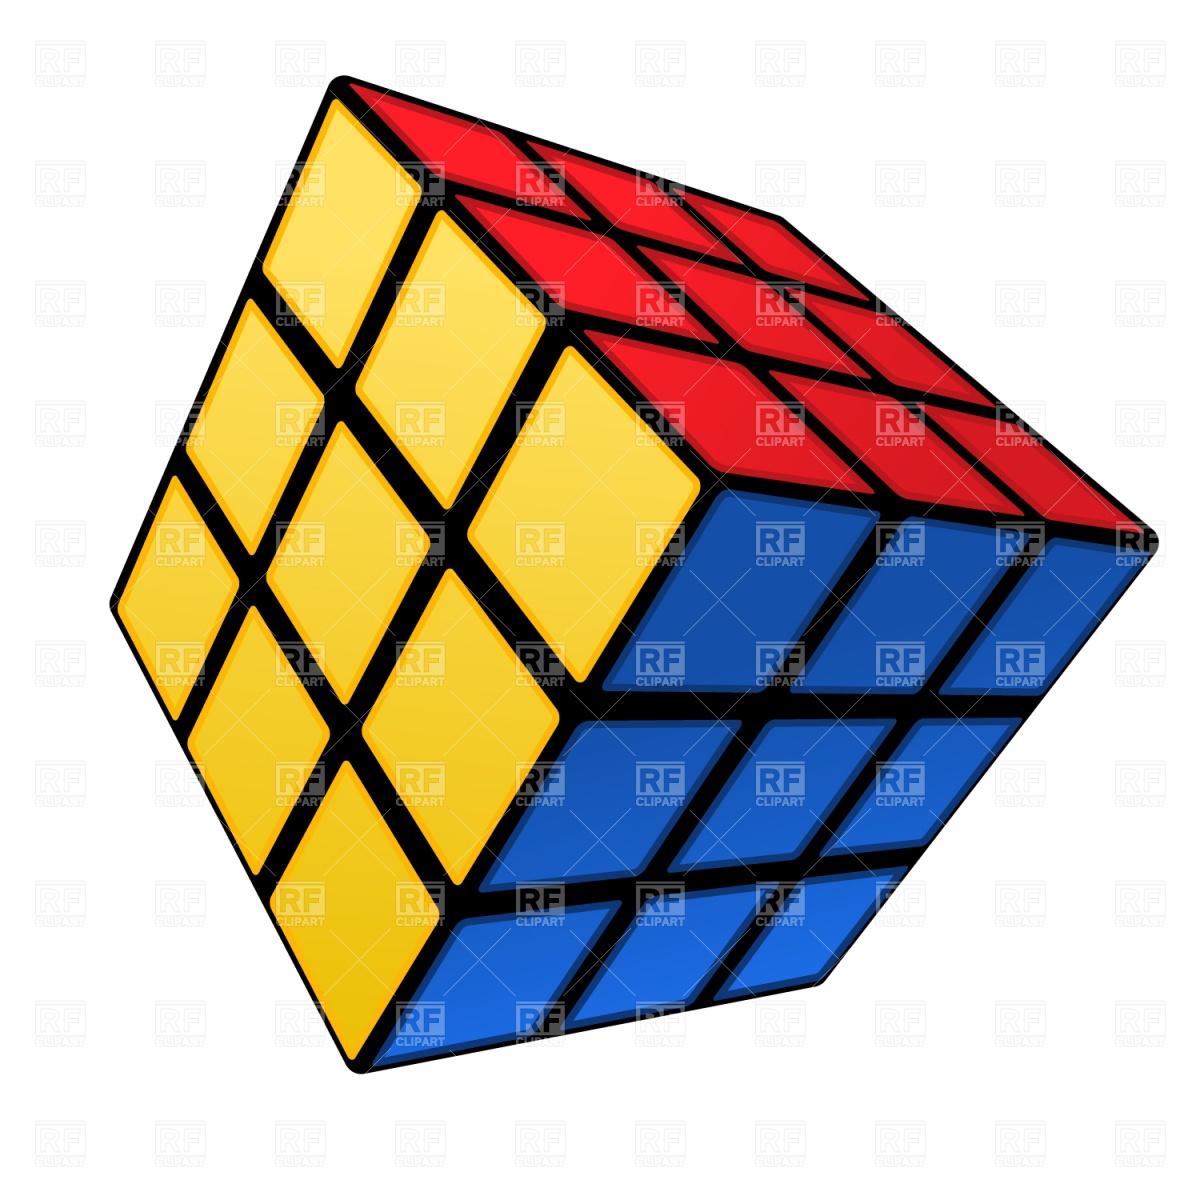 1200x1200 Rubik's Cube Royalty Free Vector Clip Art Image